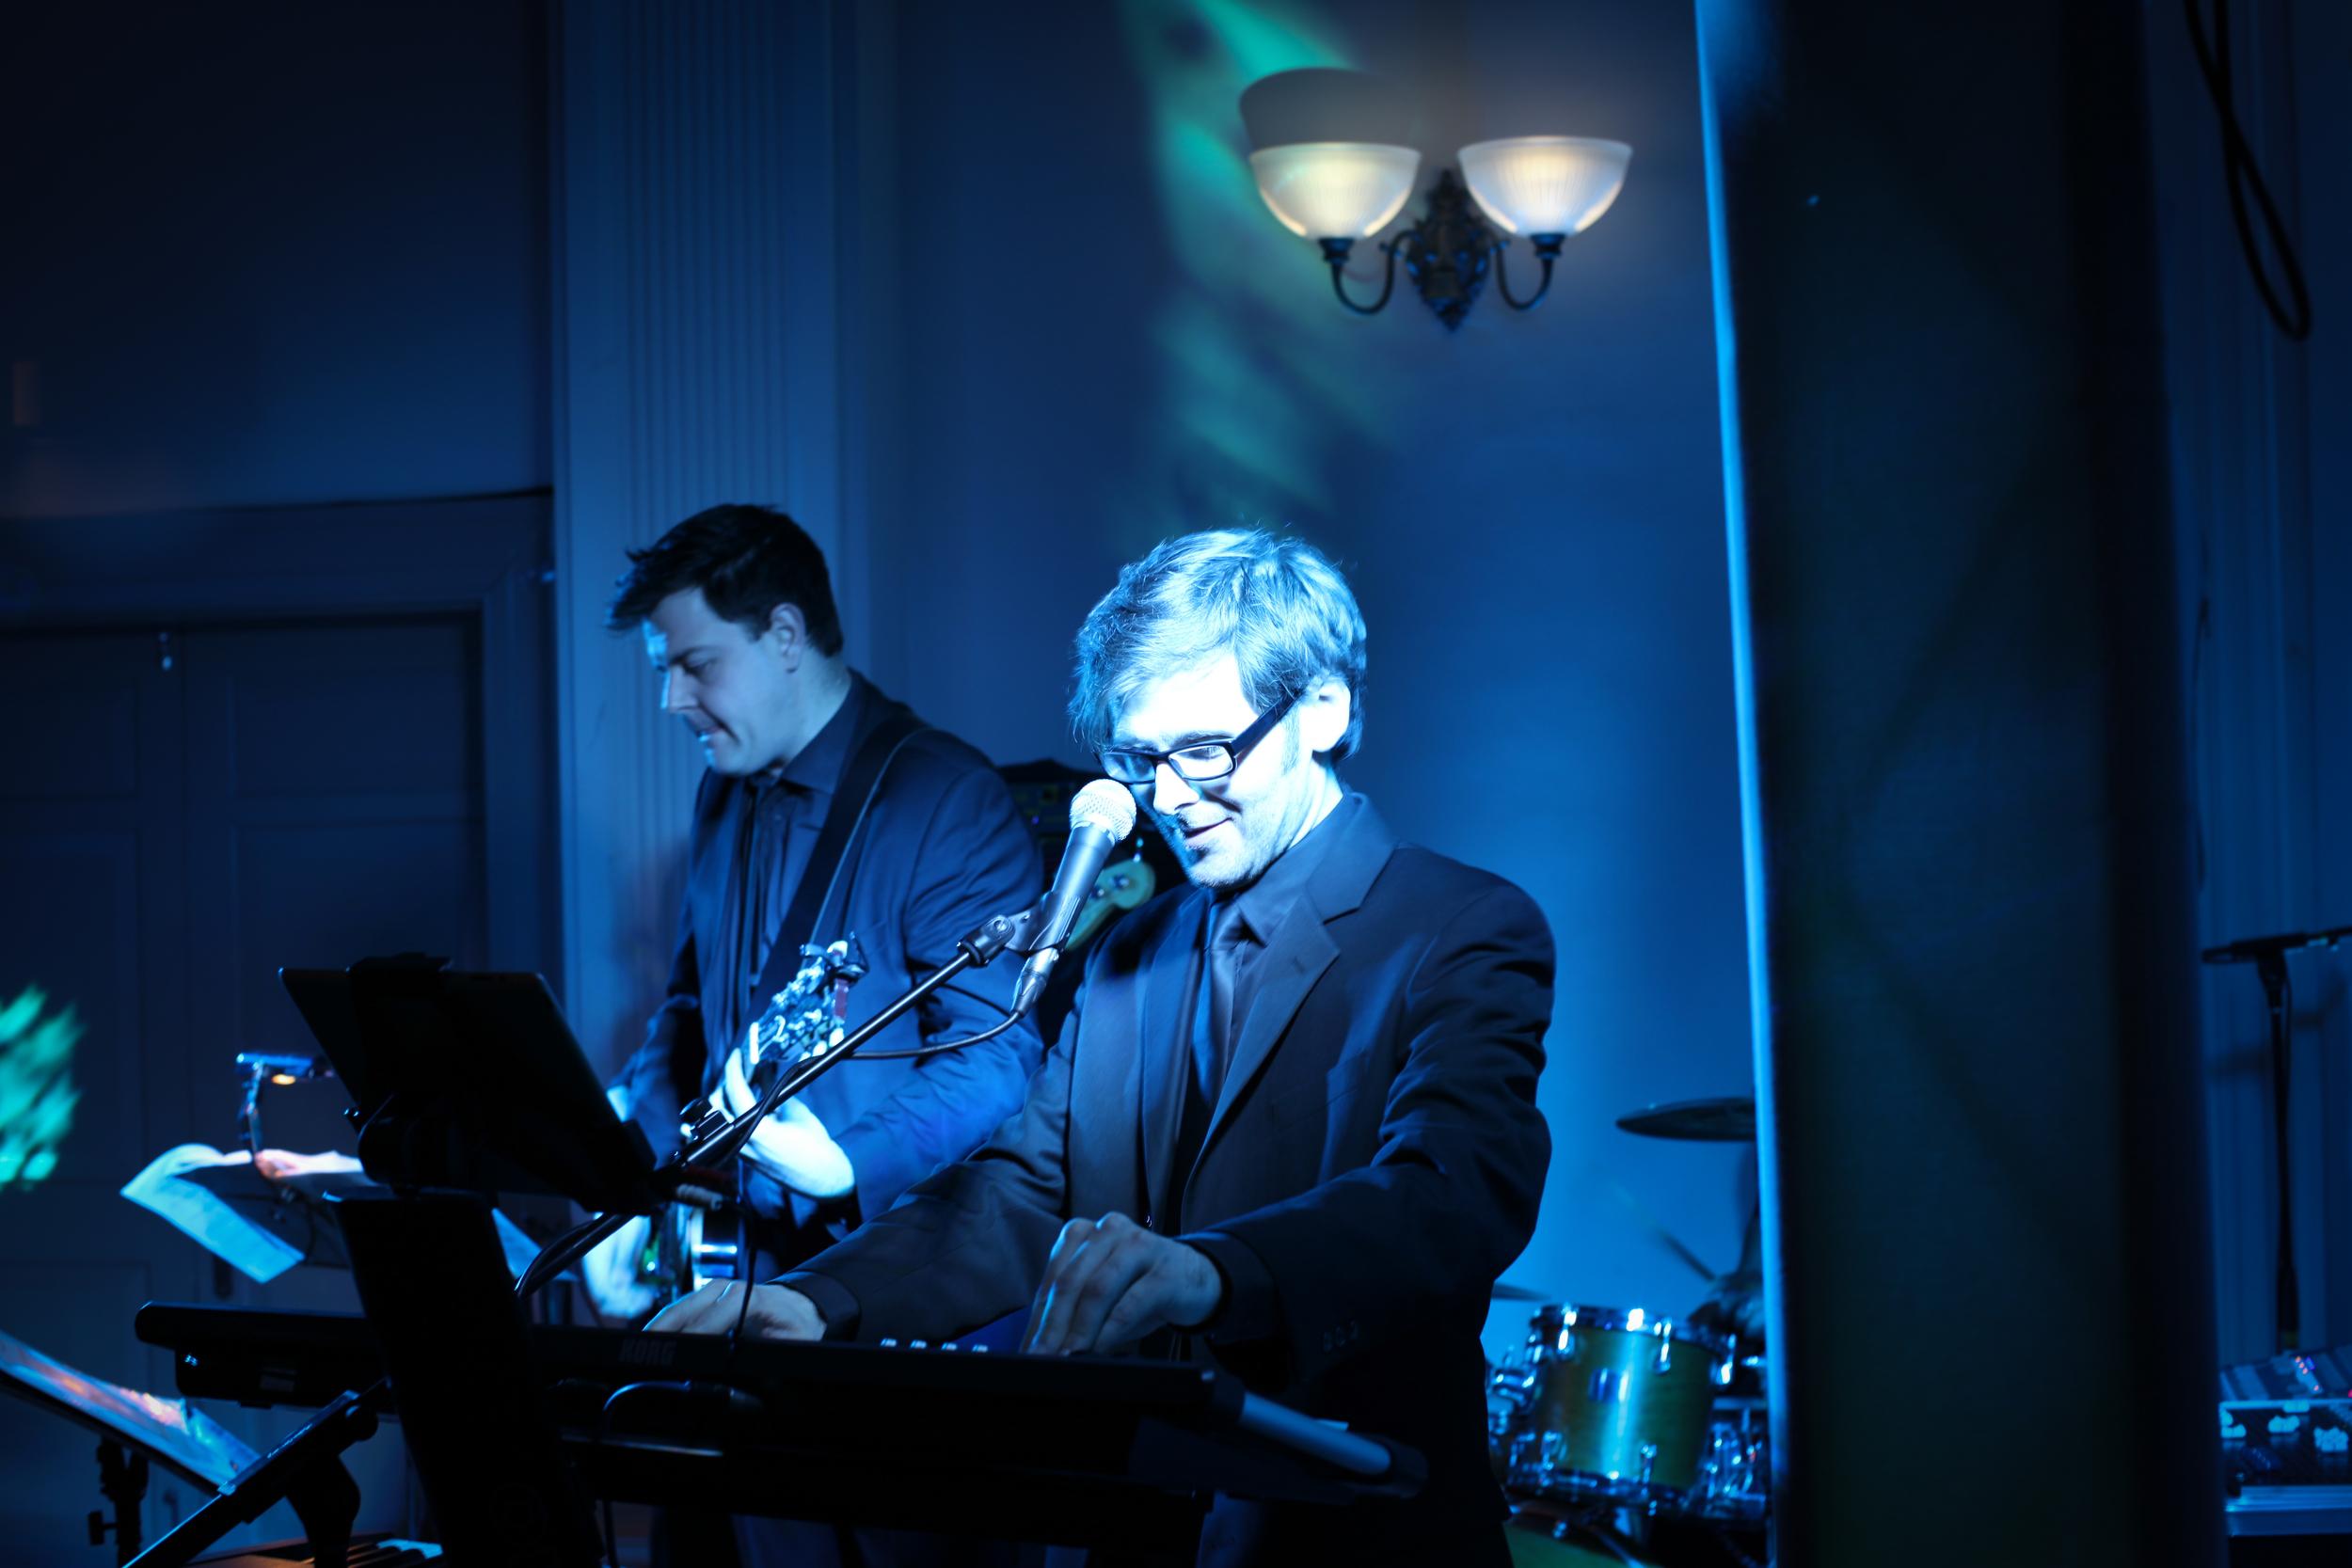 Scott Bramley Singer Pianist with ENTOURAGE Wedding Band